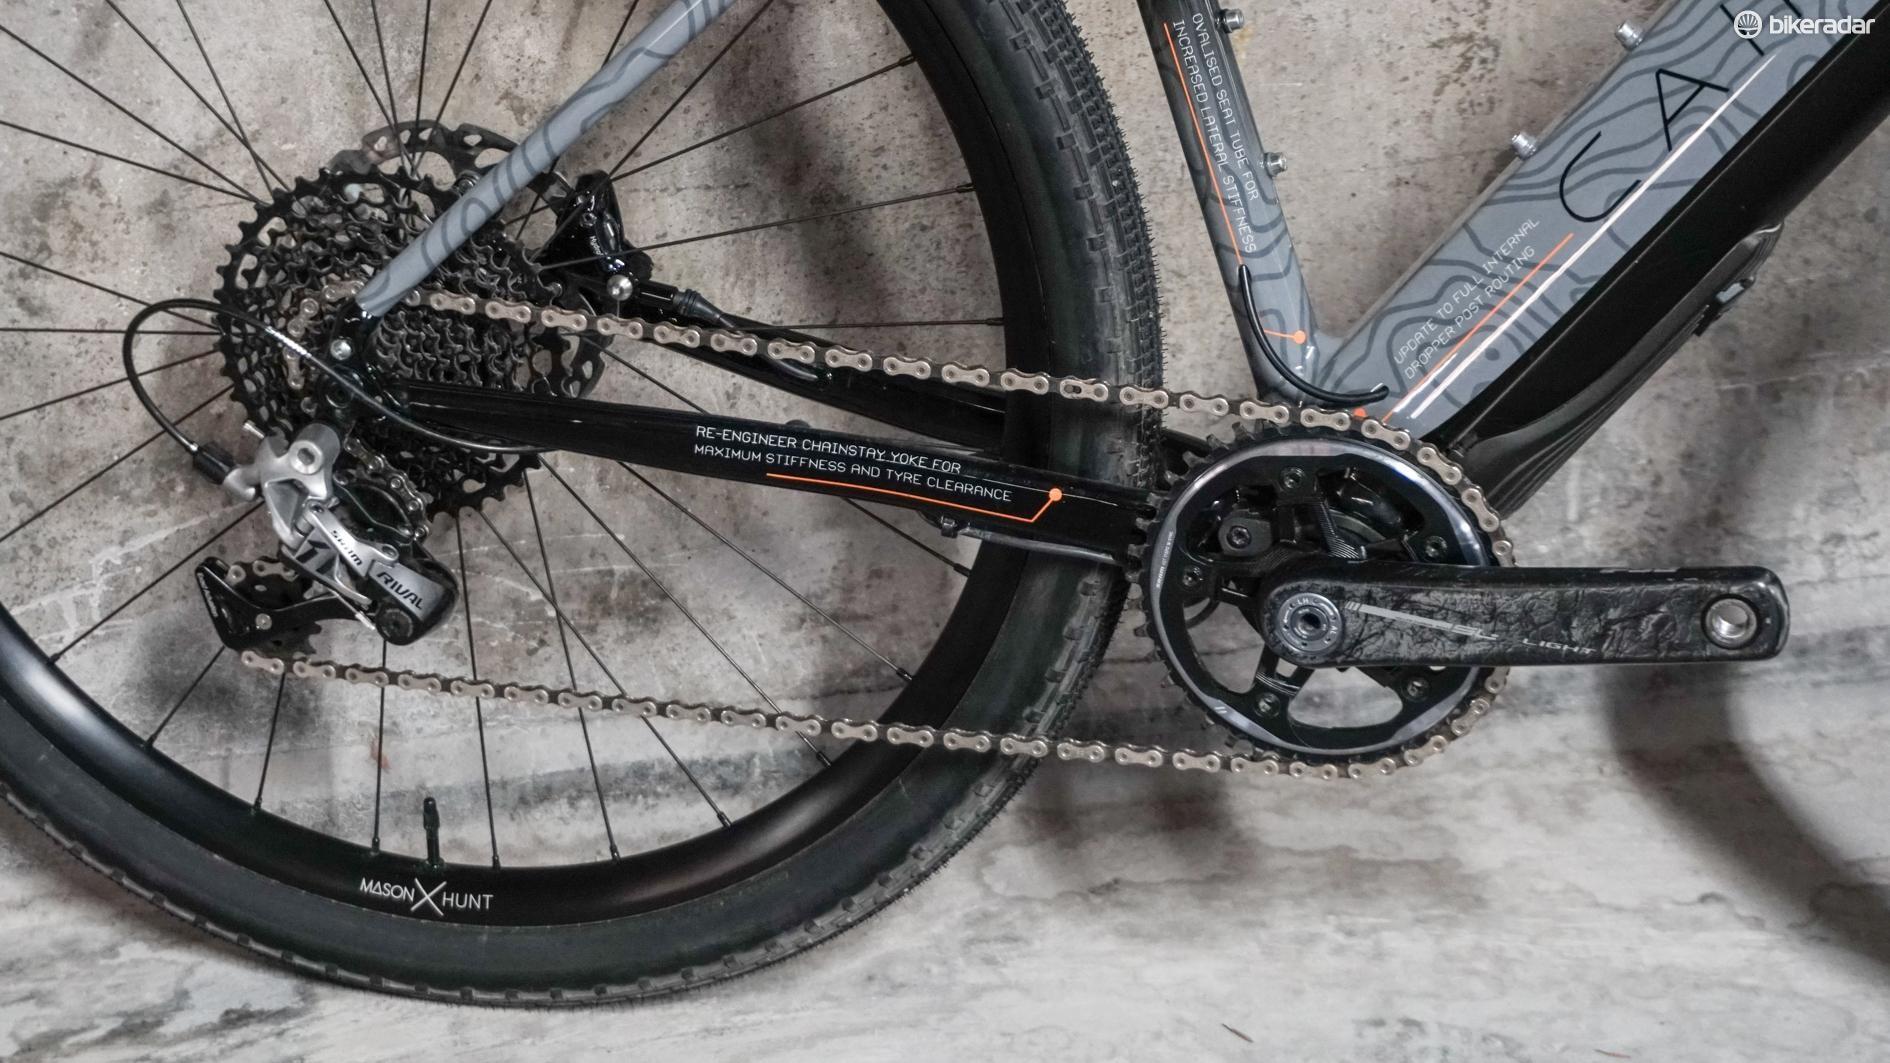 1x SRAM Rival drivetrain on e-bkie gravel bike